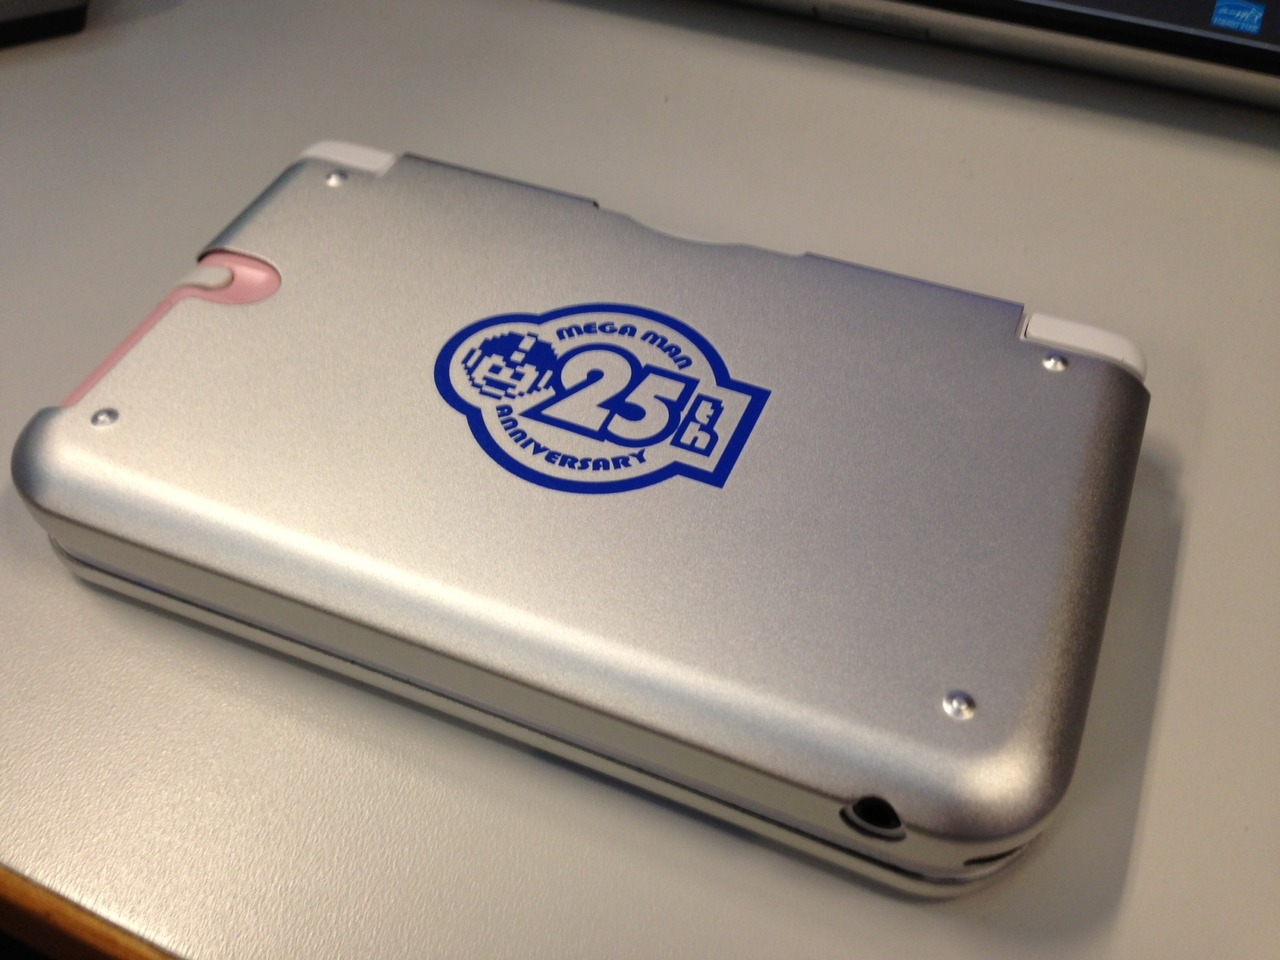 Mega Man 25th anniversary 3DS case  30-04-13 004